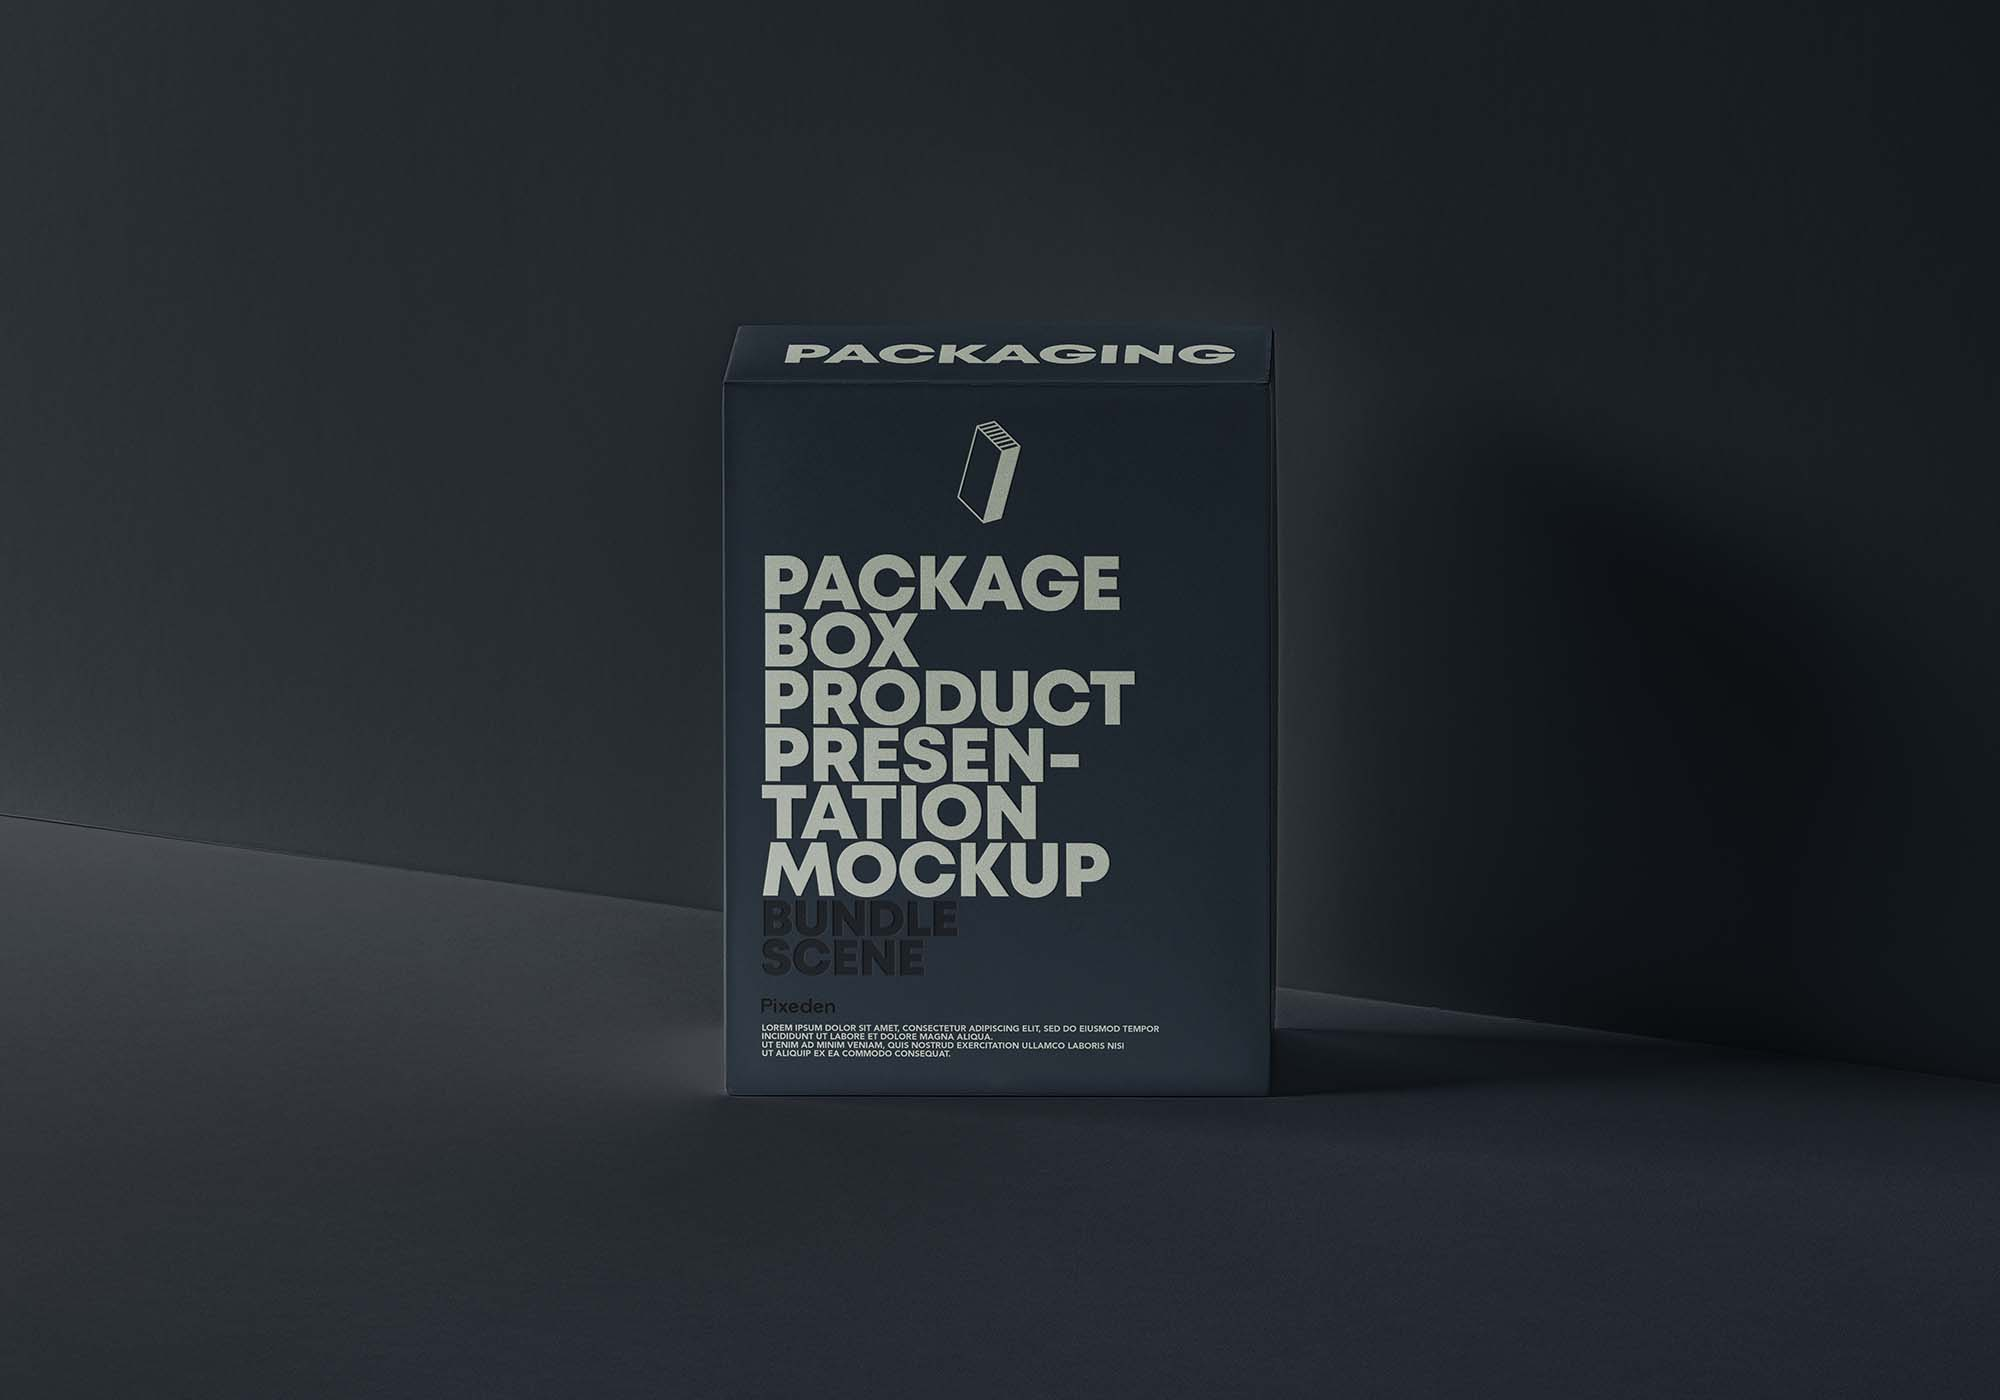 Product Packaging Box Mockup 3